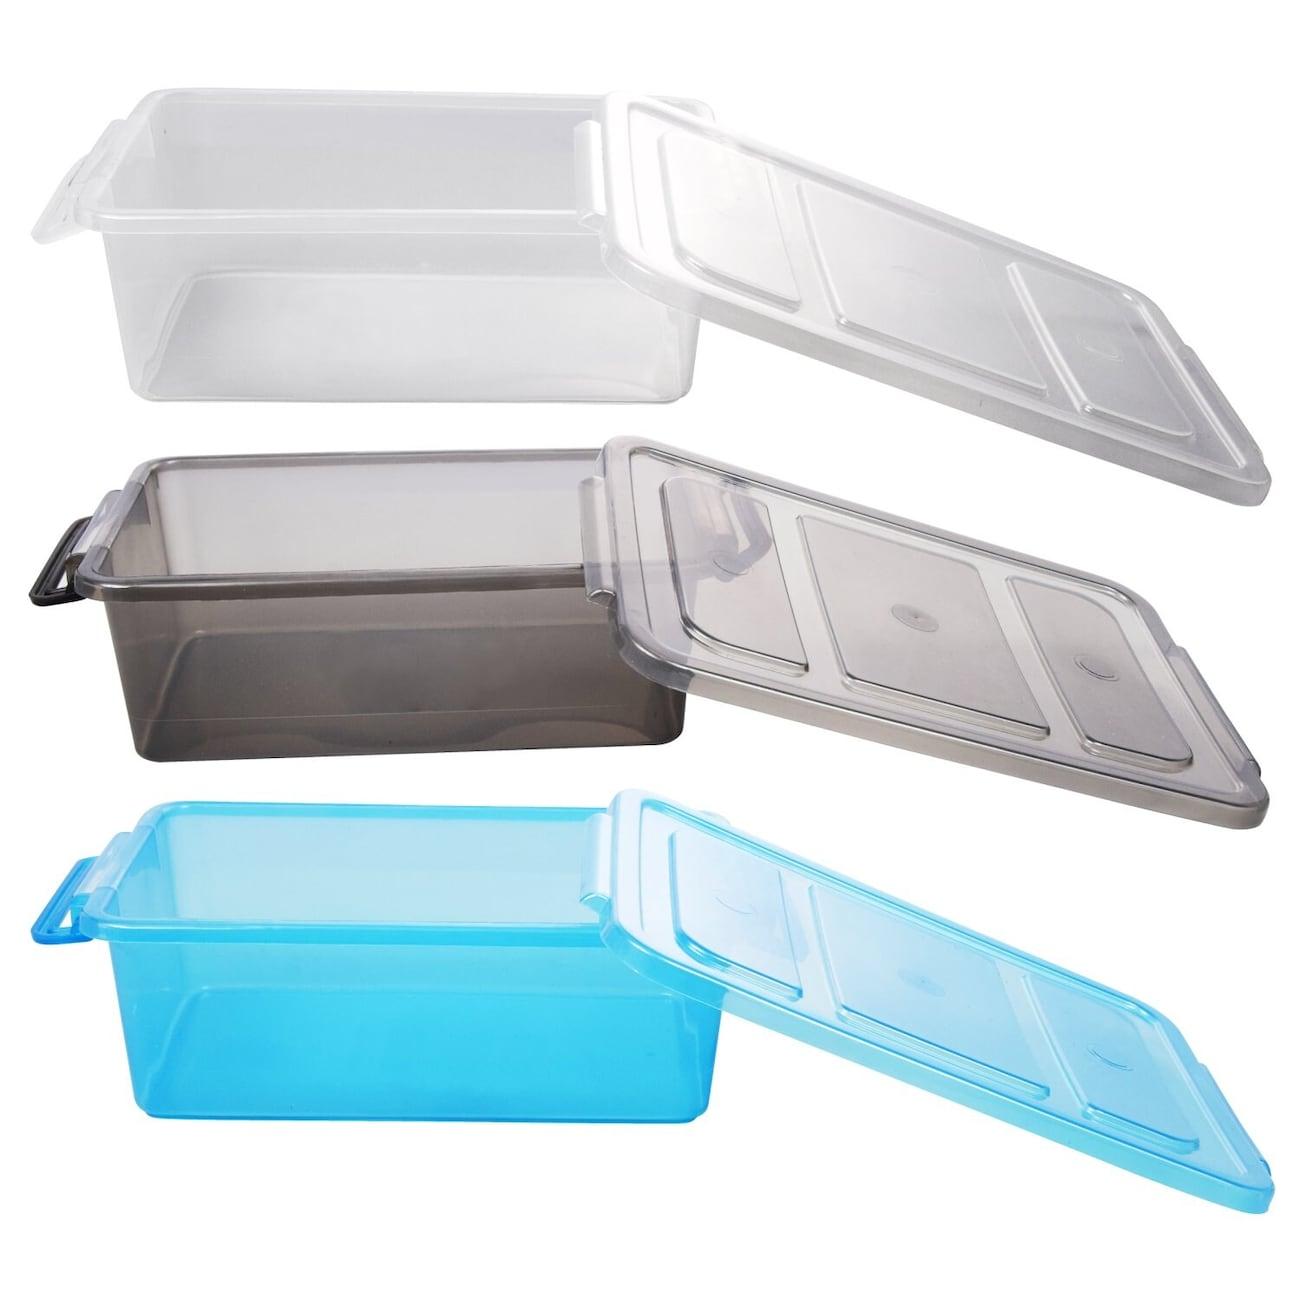 Translucent Plastic Storage Bo With Clip Lock Lids